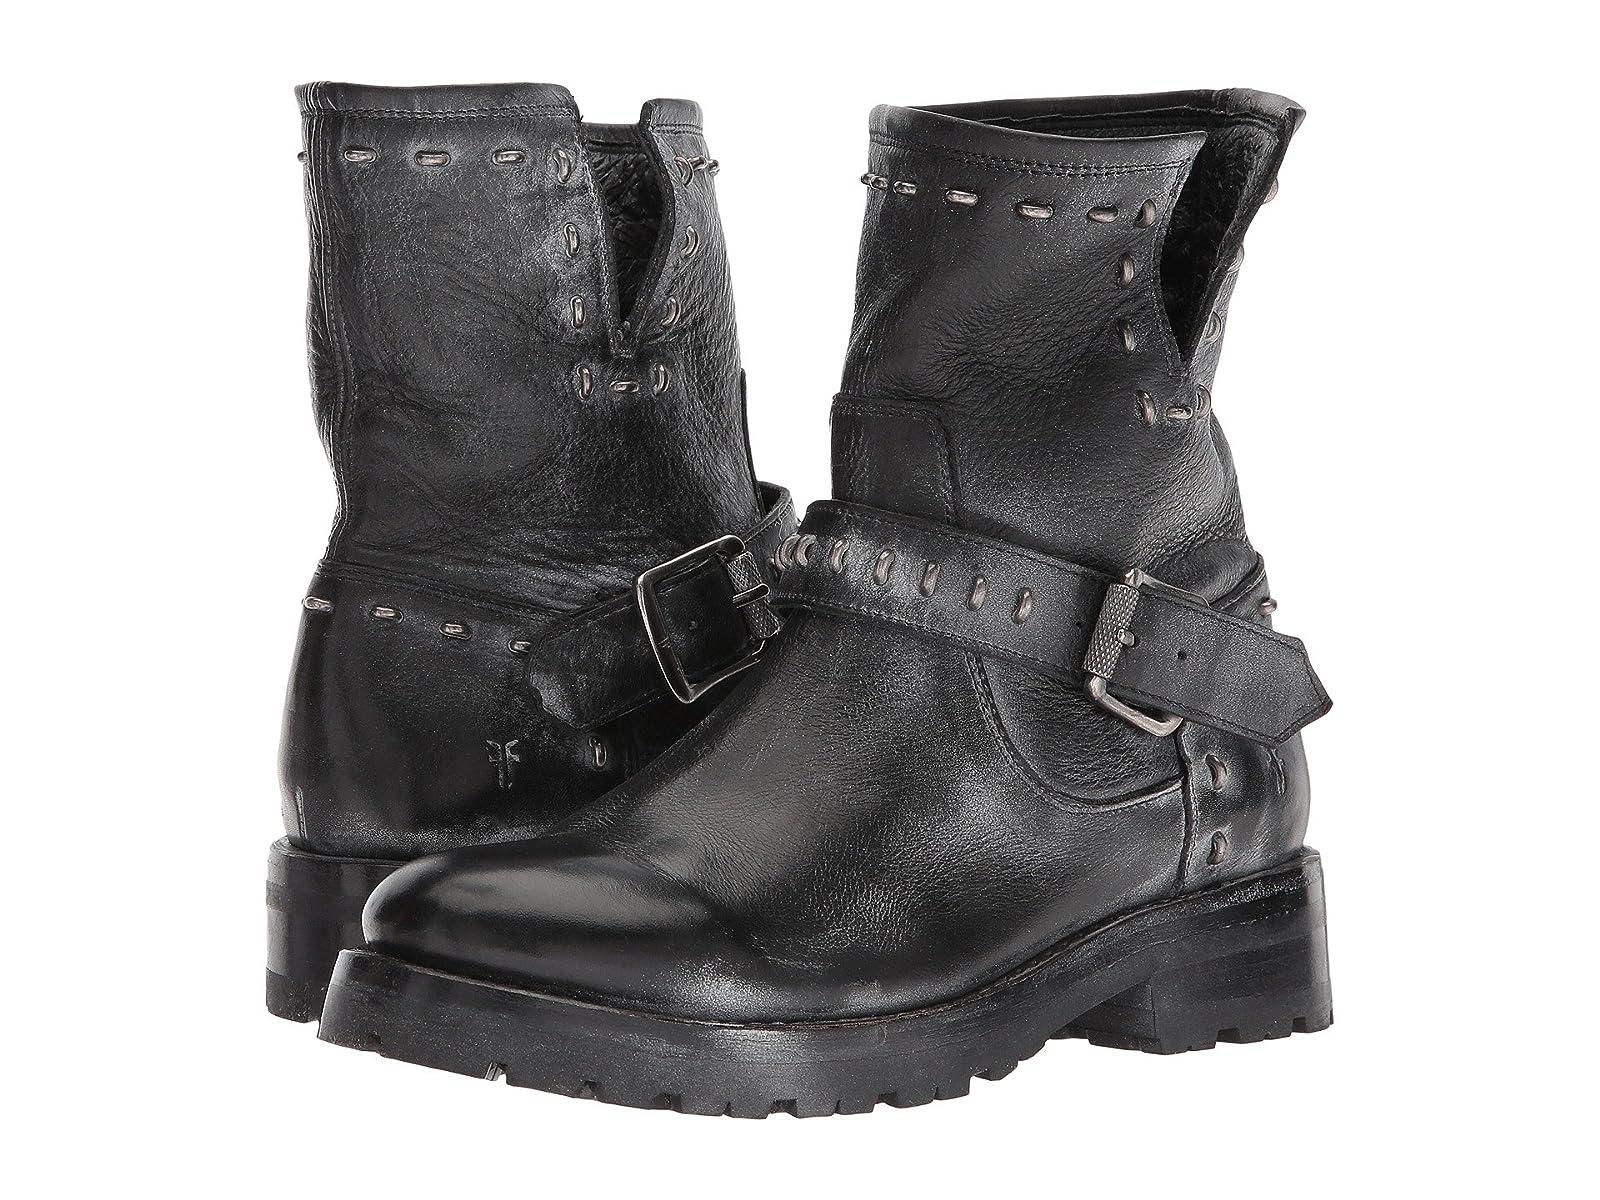 Frye Natalie Lug Rebel EngineerAffordable and distinctive shoes